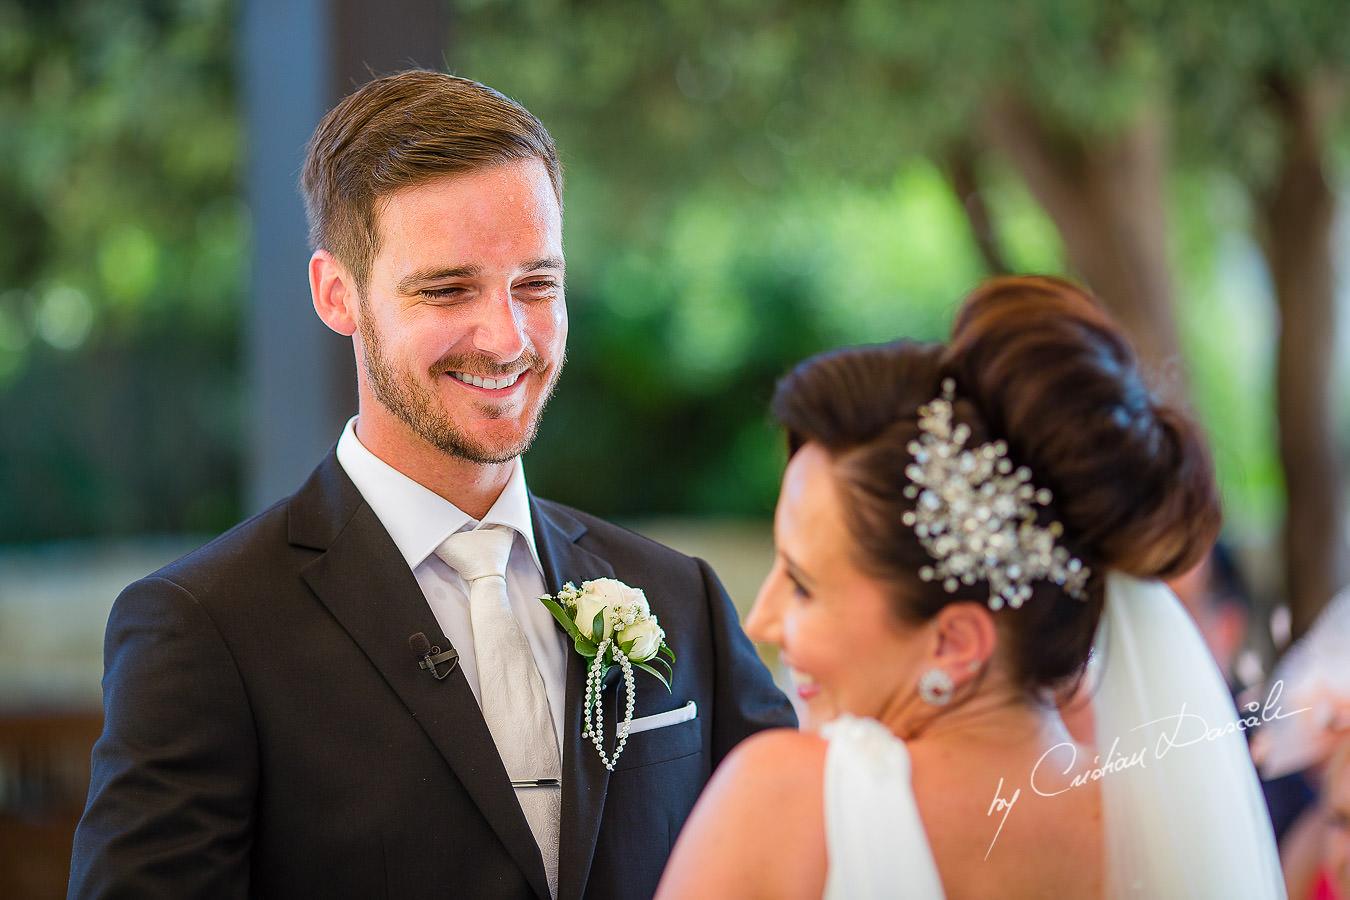 Beautiful wedding moments captured by Cristian Dascalu during an elegant Aphrodite Hills Wedding in Cyprus.